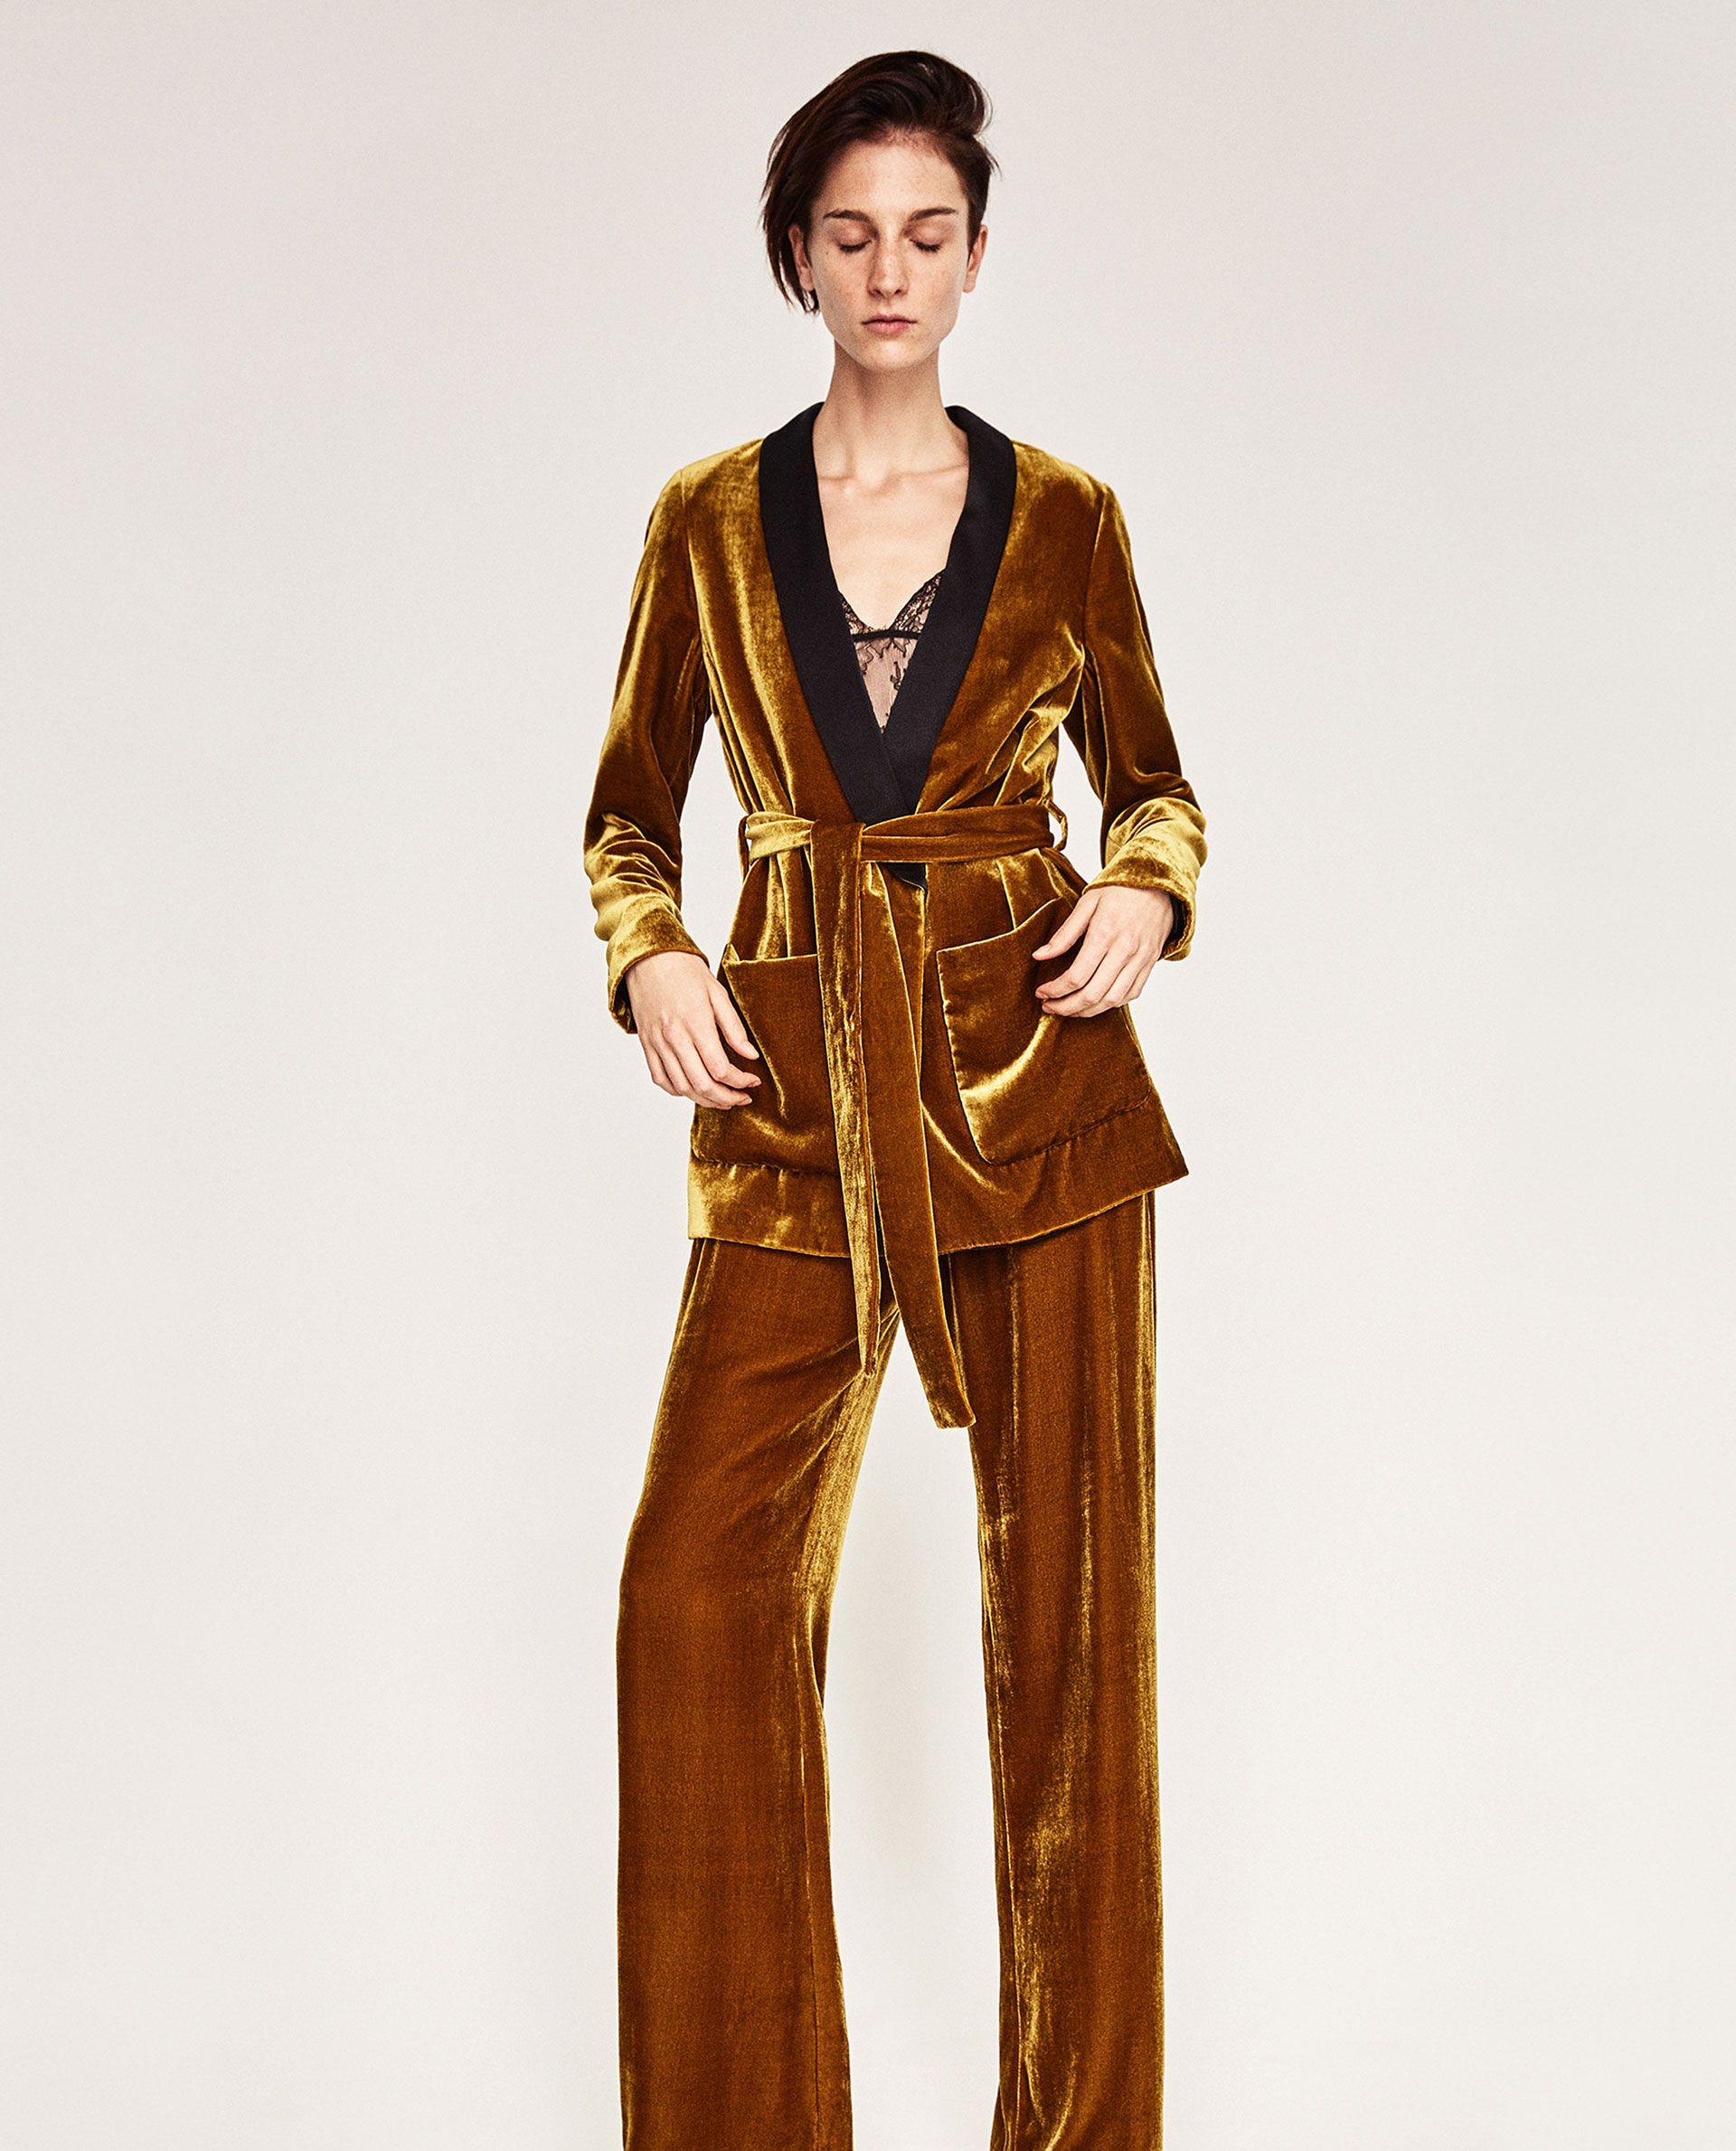 Terciopelo Zara Abrigos Chaqueta España Rebajas Cinturón Mujer Xuxawq6ex w8PqTwg